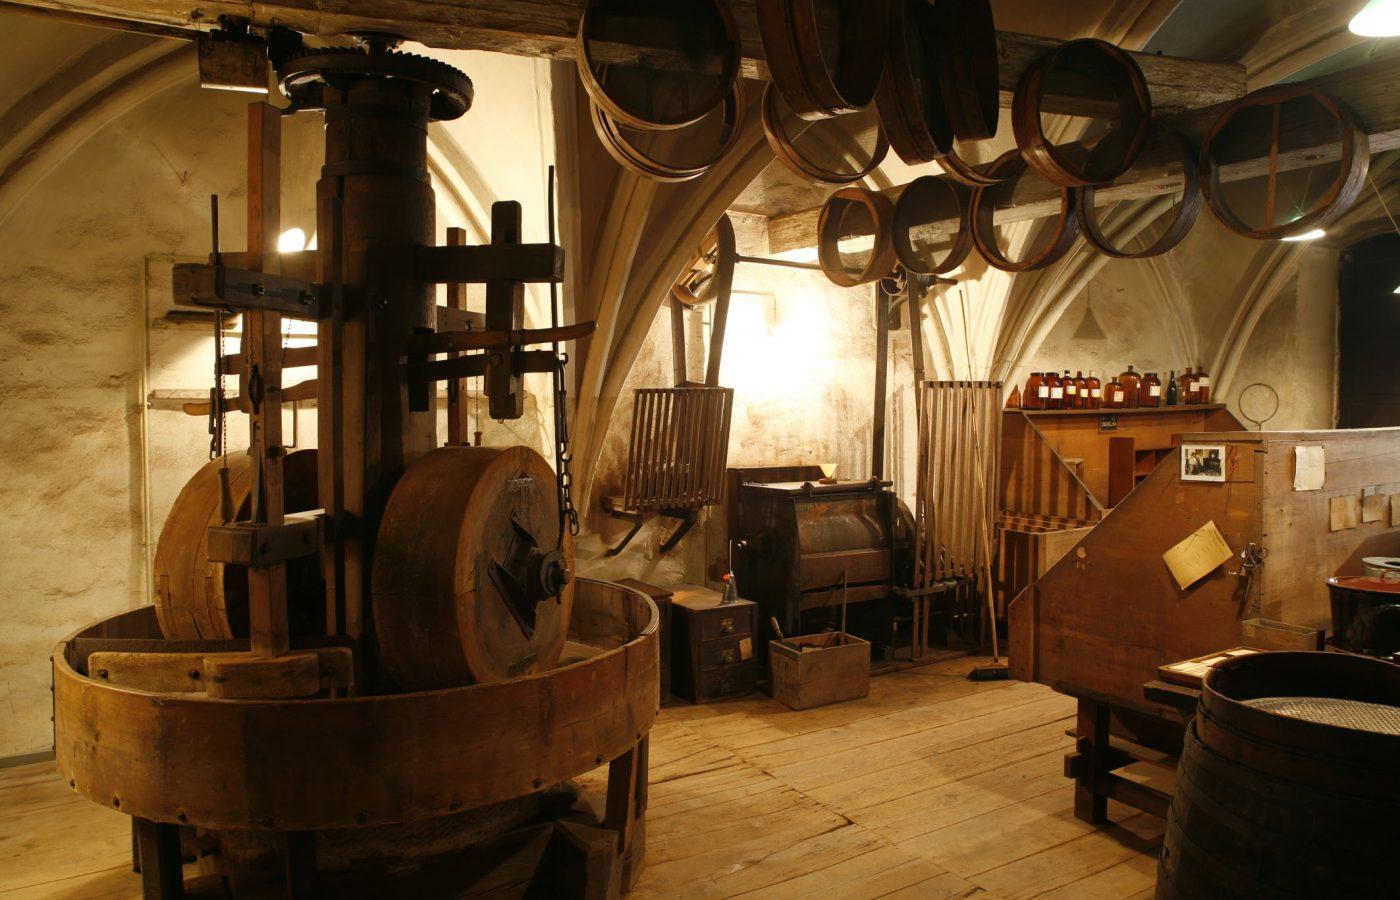 hotel_bad_abbach_ausflugsziel_regensburg_schnupftabakfabrik